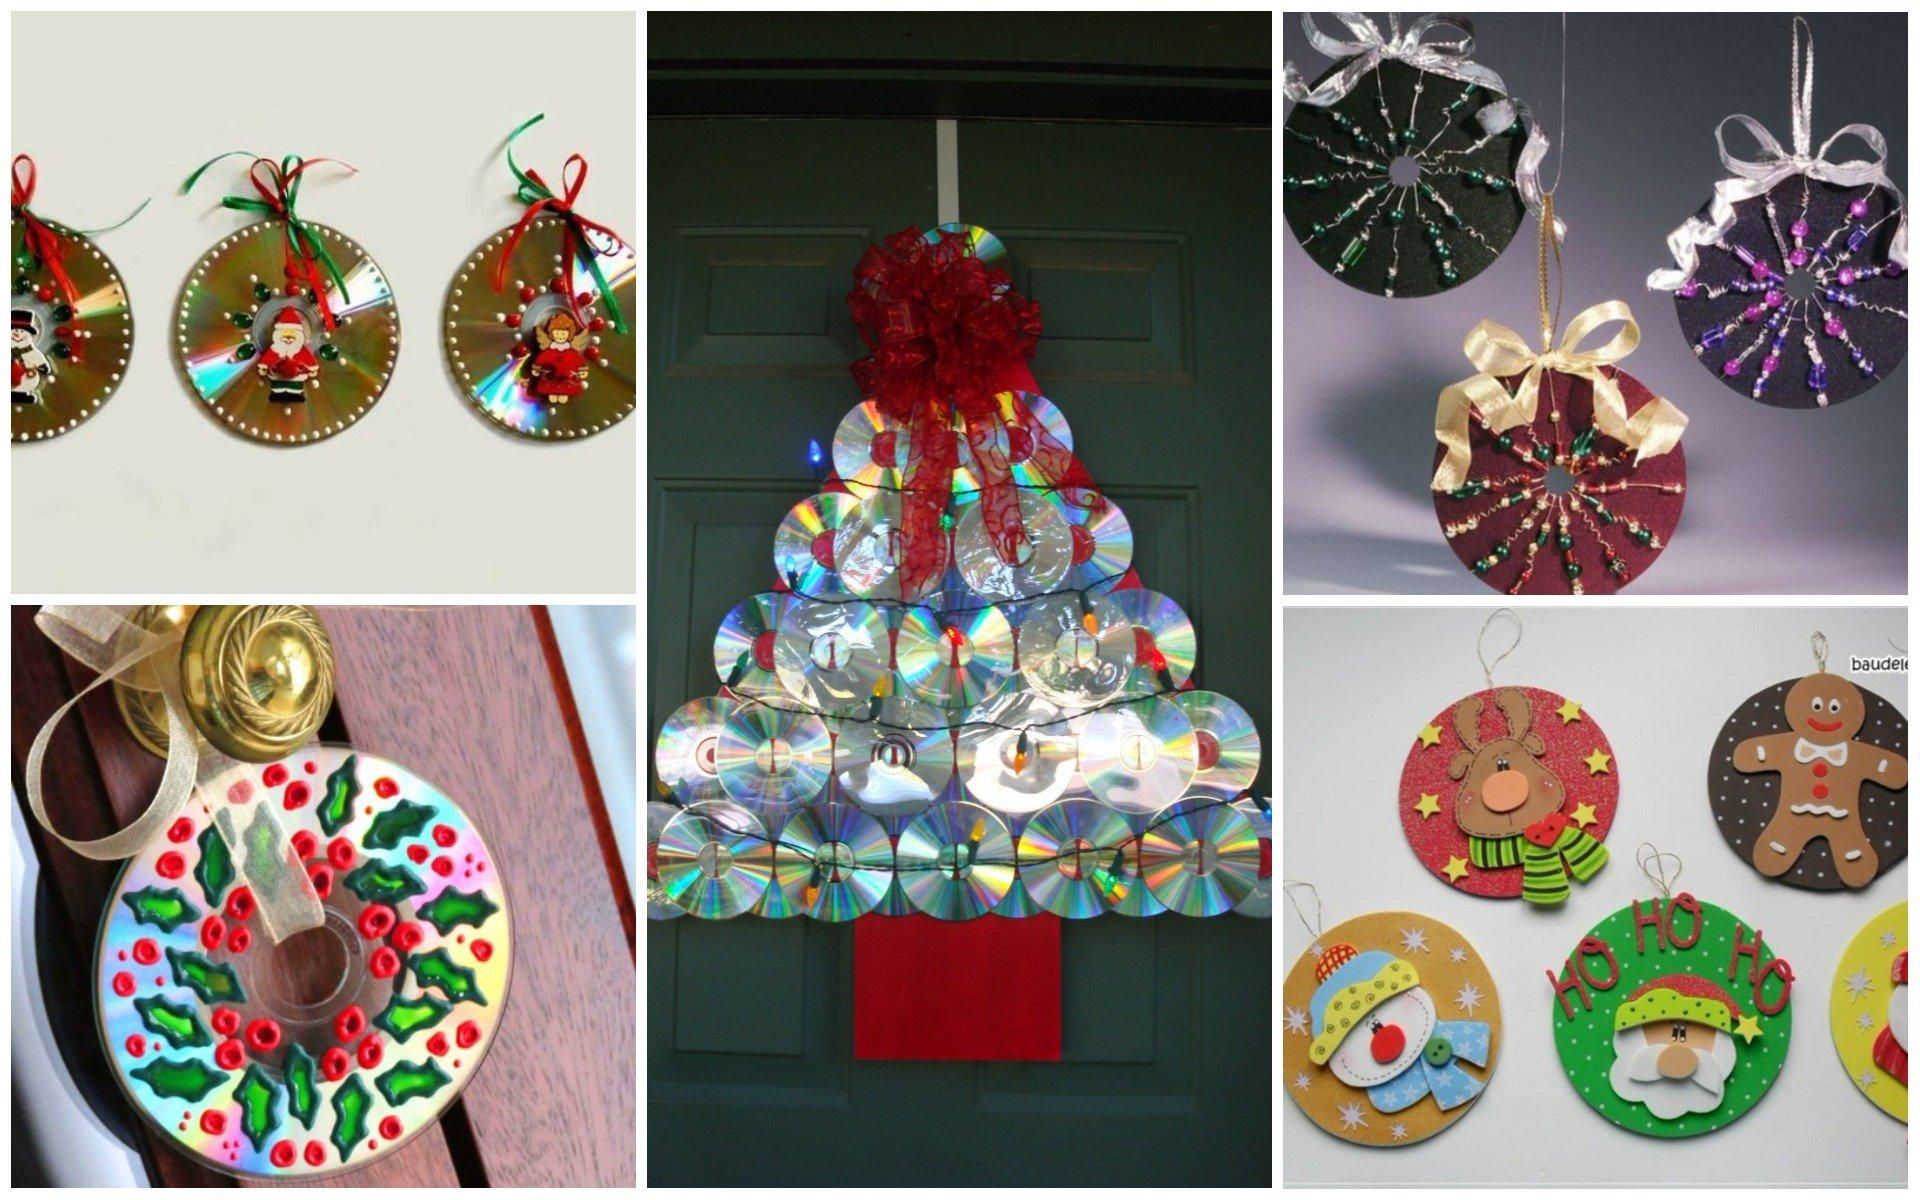 christmas decorations Archives - Architecture Art Designs